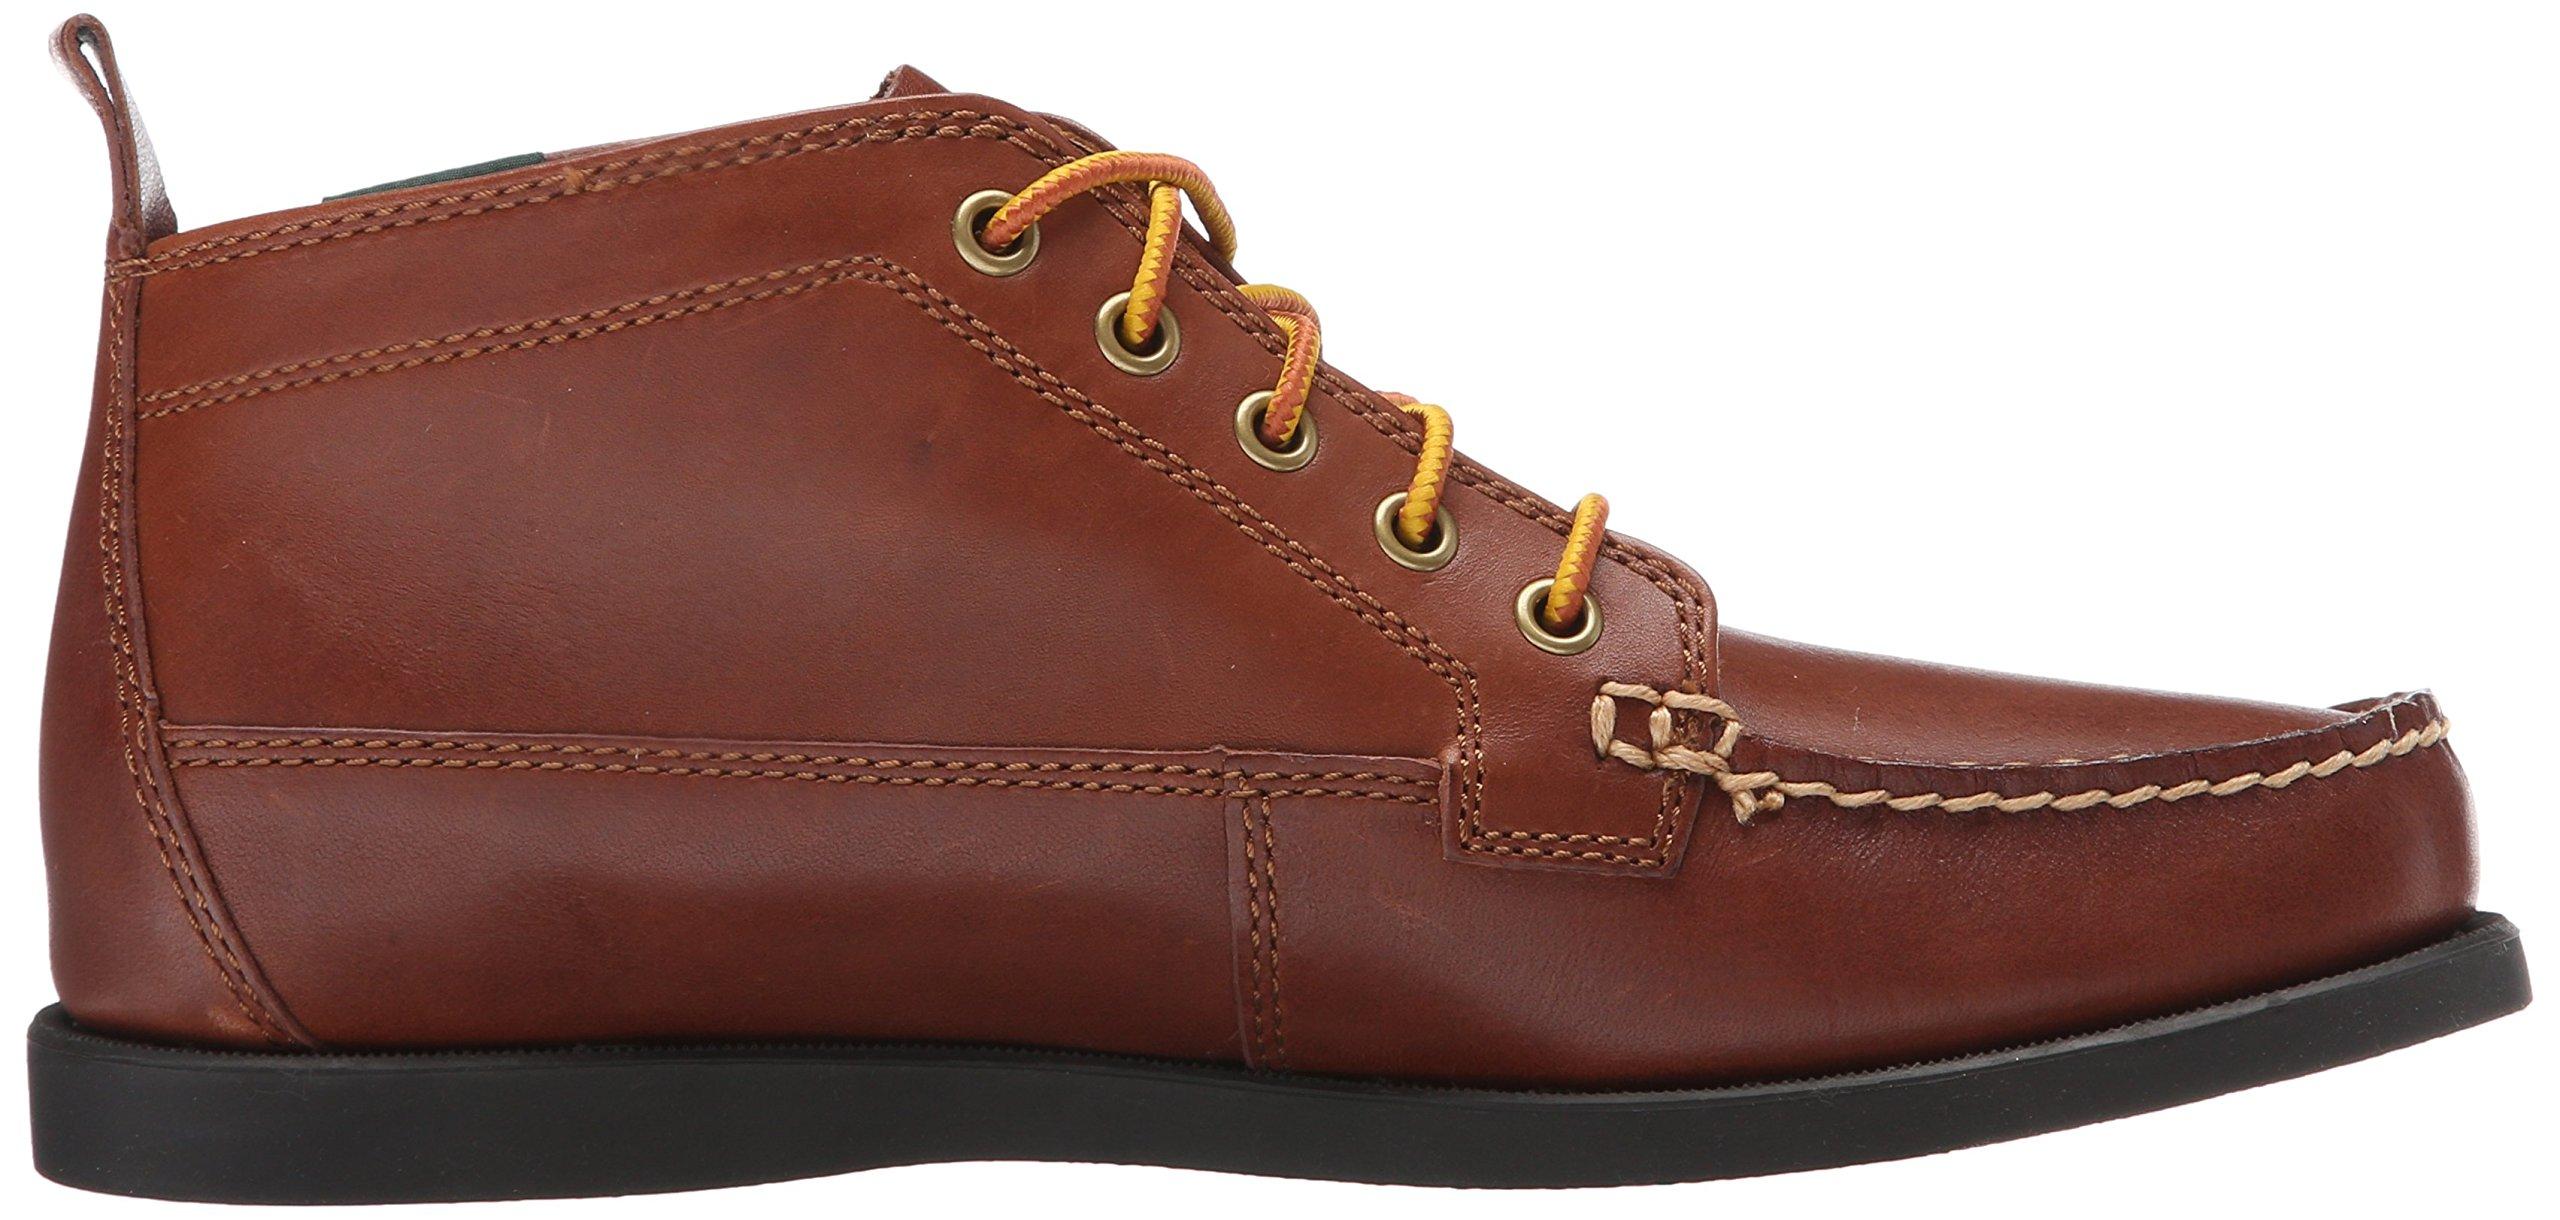 Eastland Men's Seneca Chukka Boot, Tan, 14 W US by Eastland (Image #7)